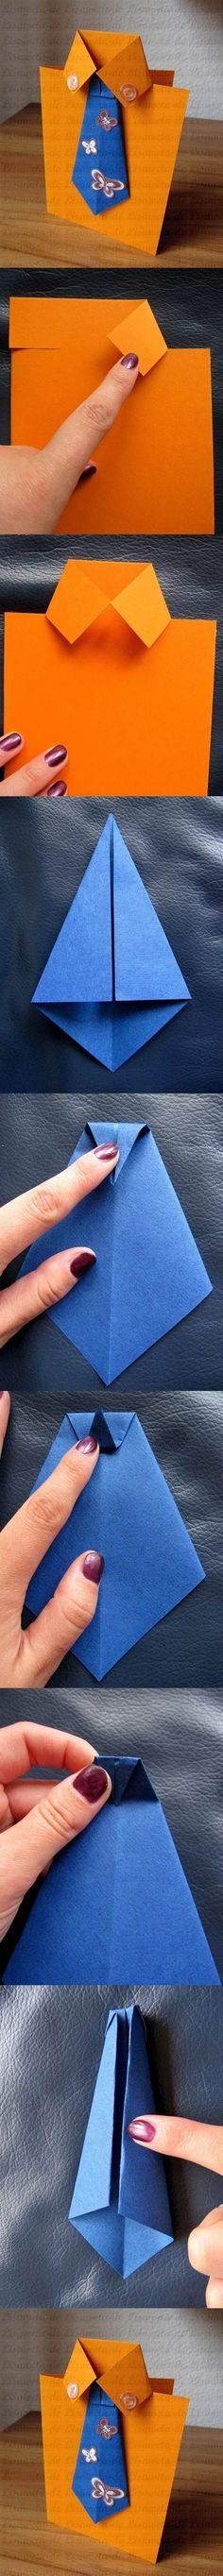 DIY Tie and Shirt Greeting Card | iCreativeIdeas.com Like Us on Facebook == https://www.facebook.com/icreativeideas: